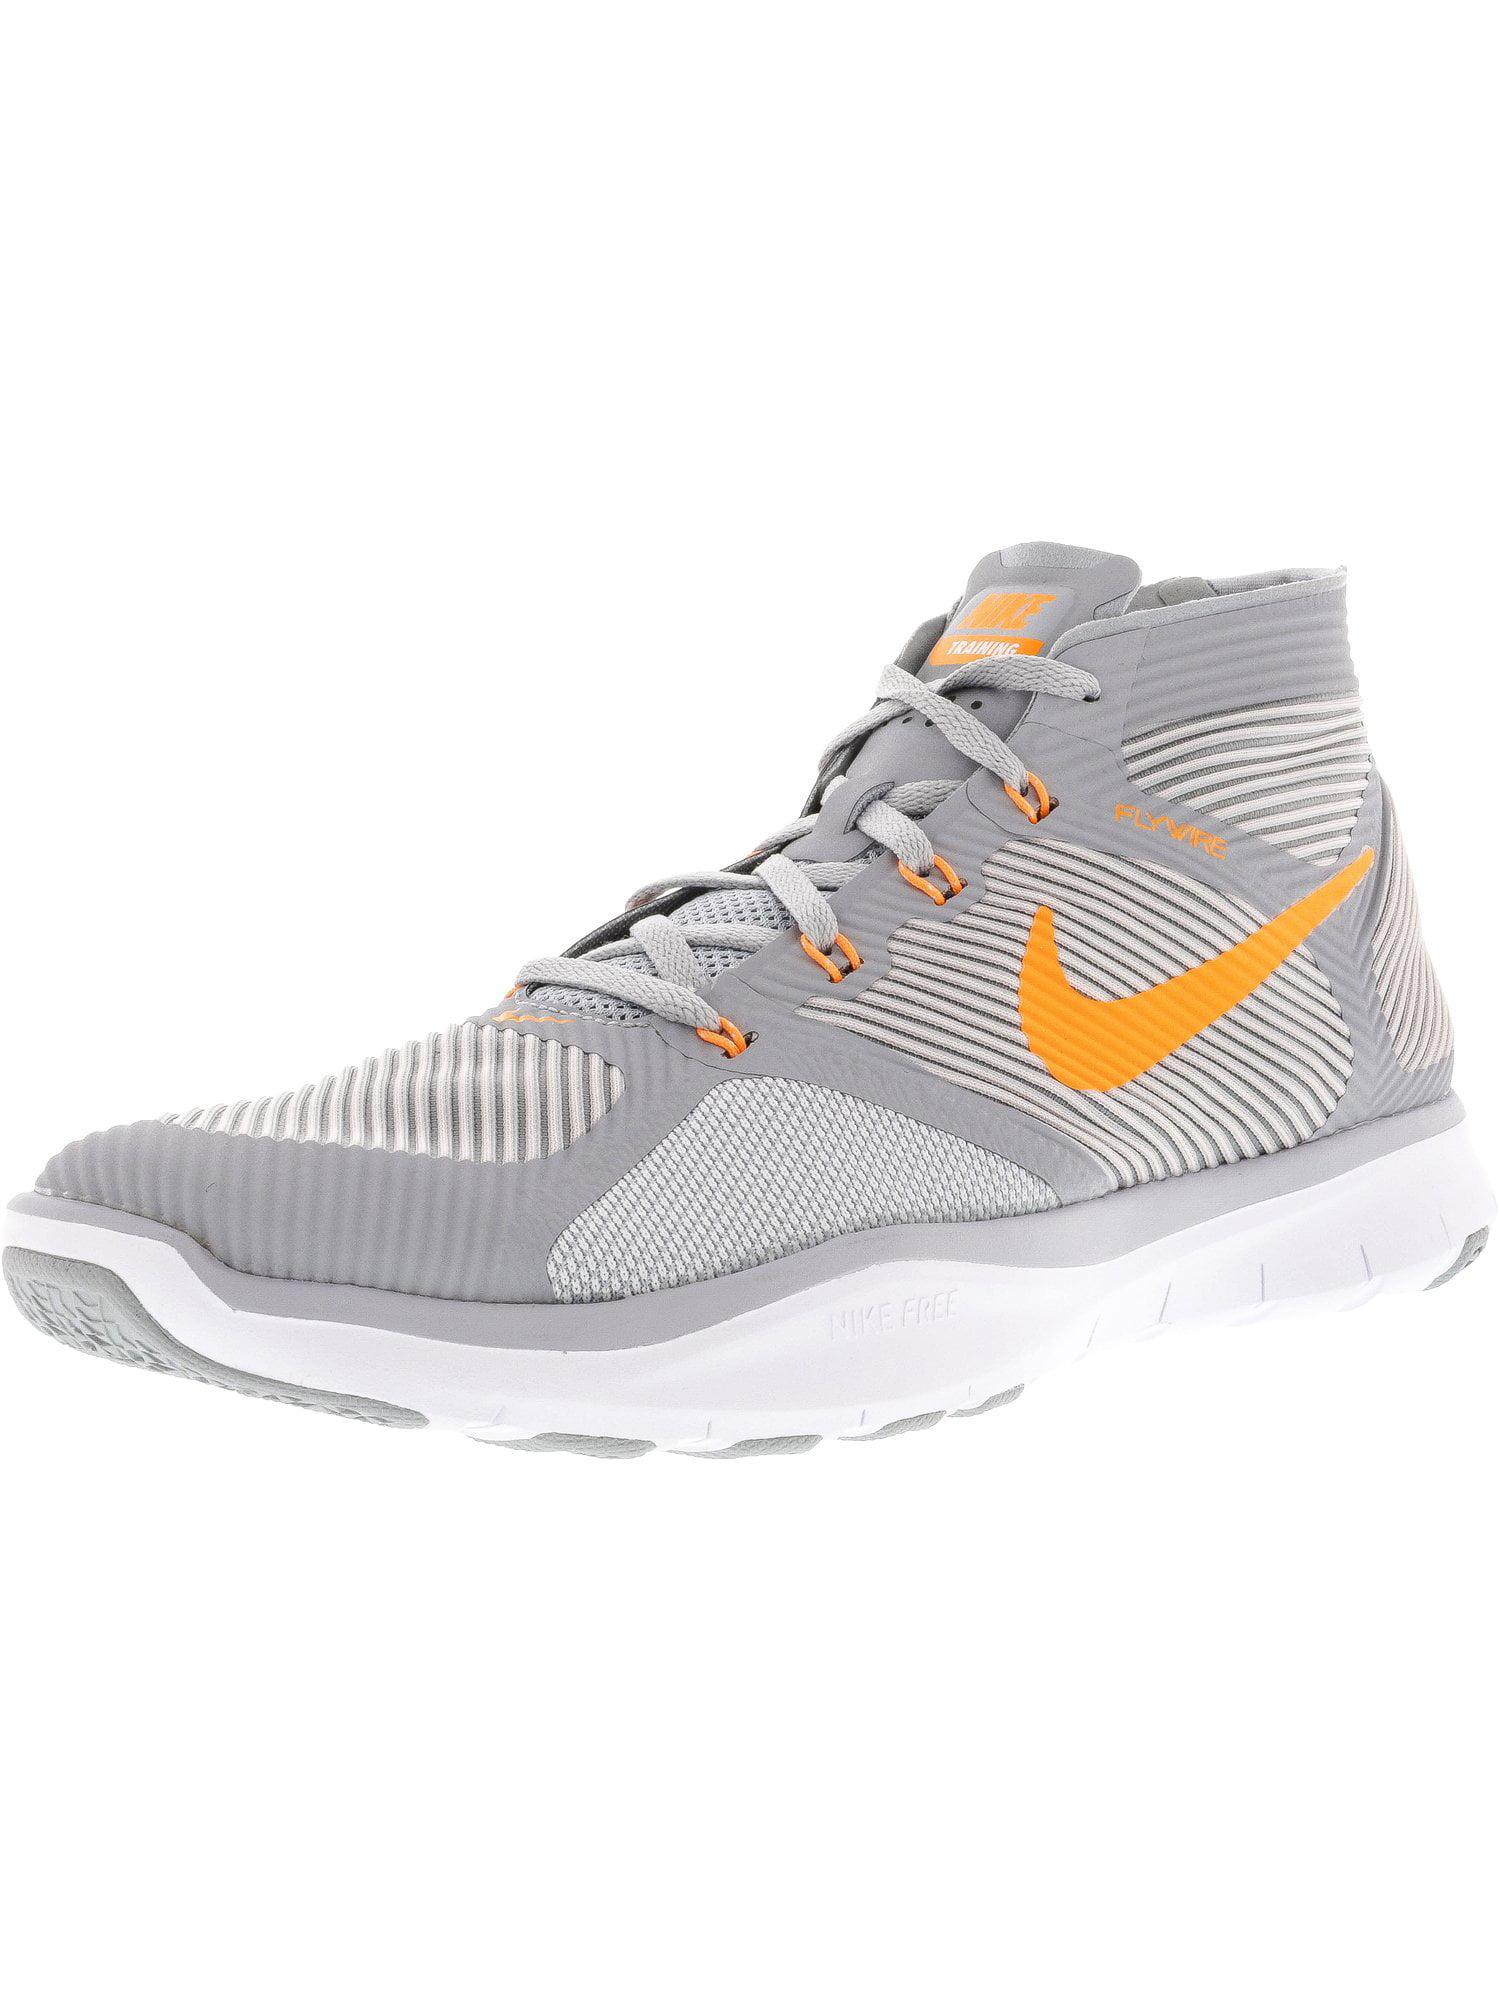 Nike Men's Free Train Instinct Wolf Grey / Bright Citrus Ankle-High Running Shoe - 10M